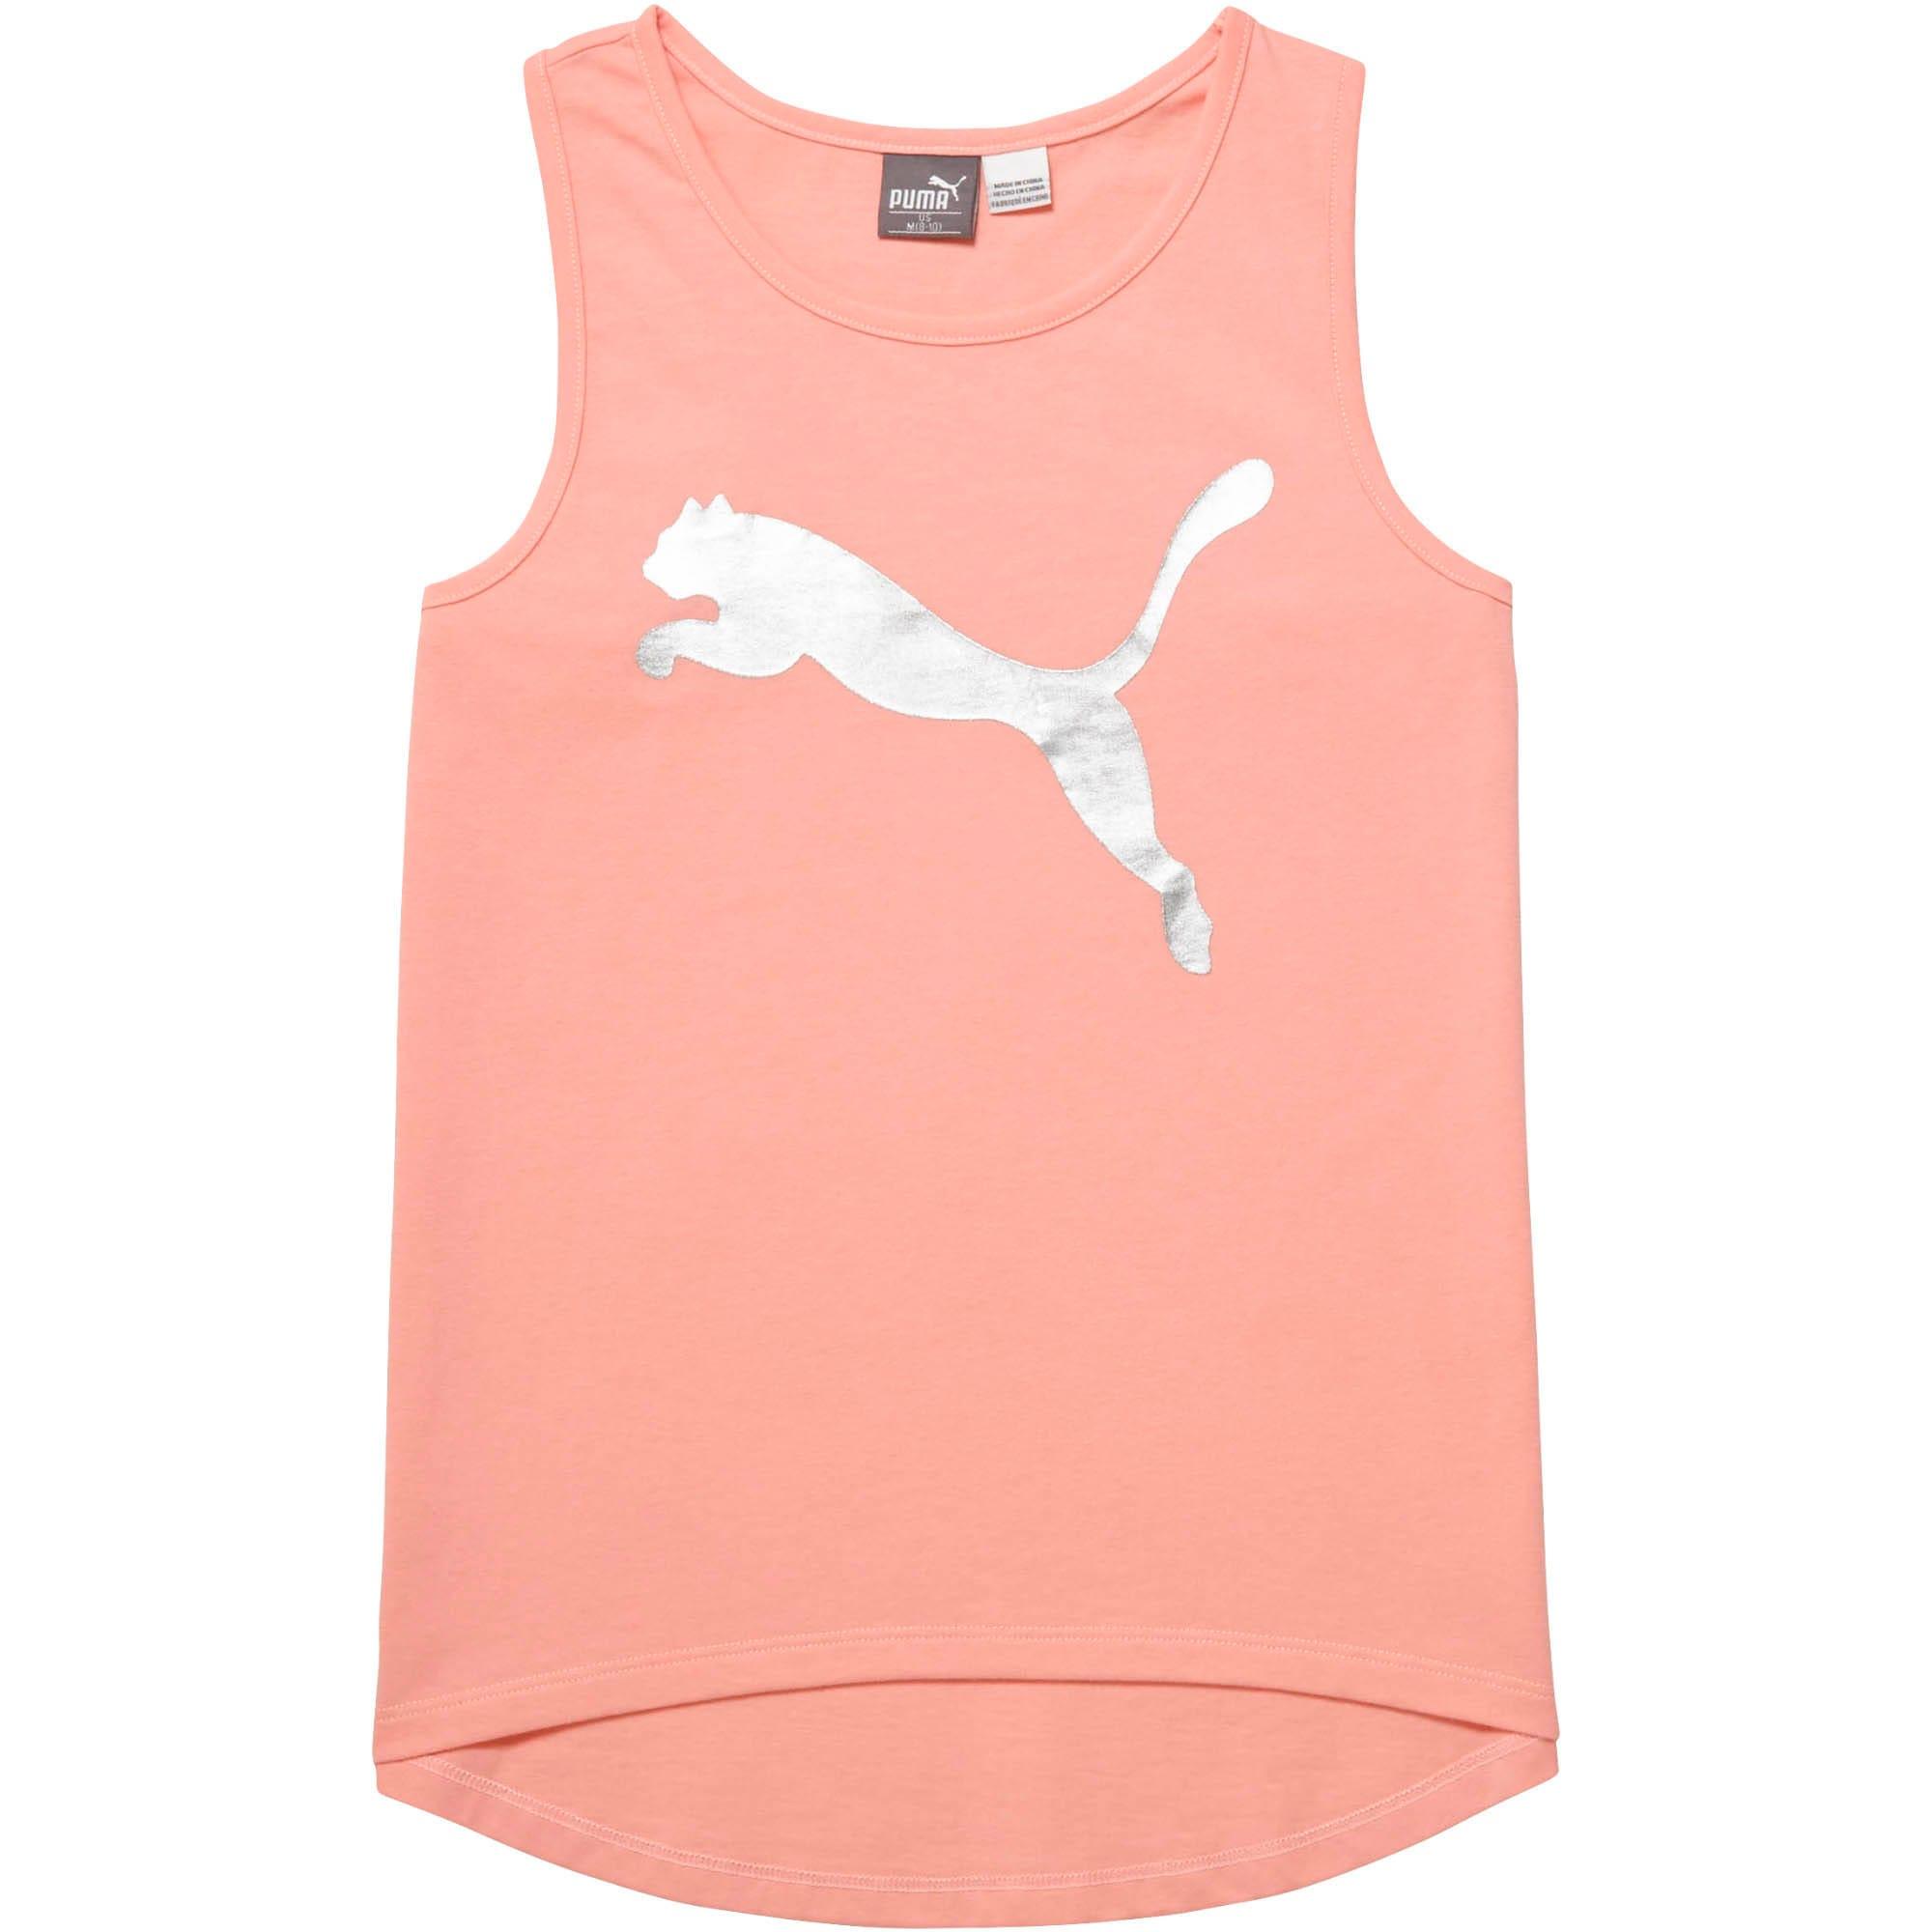 Thumbnail 1 of Girls' Cotton Jersey Fashion Tank JR, PEACH BUD, medium